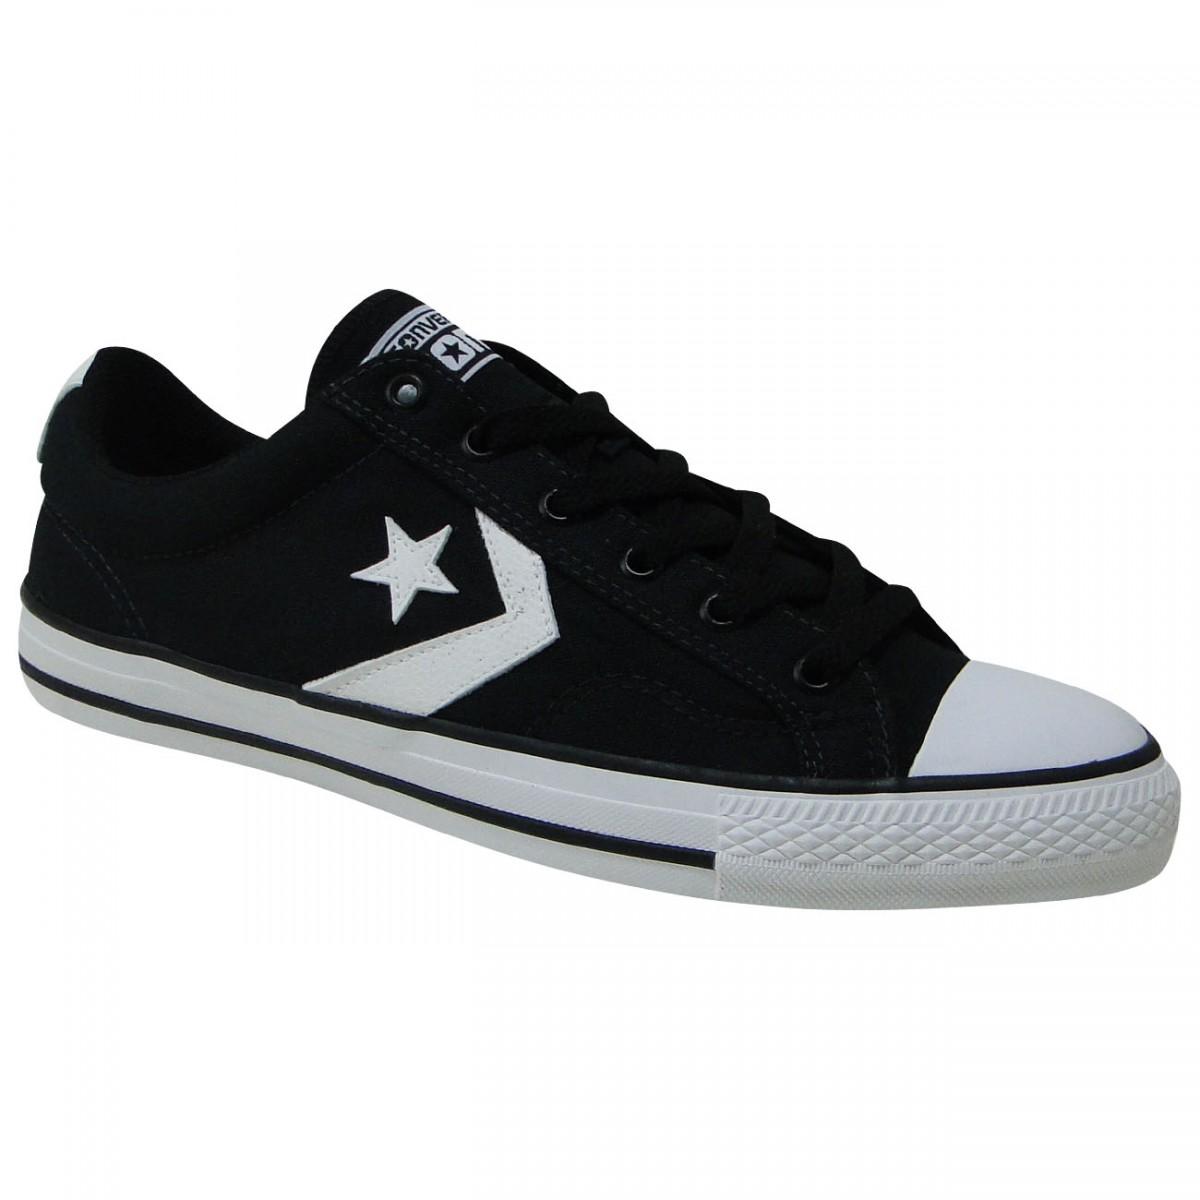 3fcfece662a6 Tênis All Star Converse Star Player CO350001 - Preto Branco - Chuteira  Nike